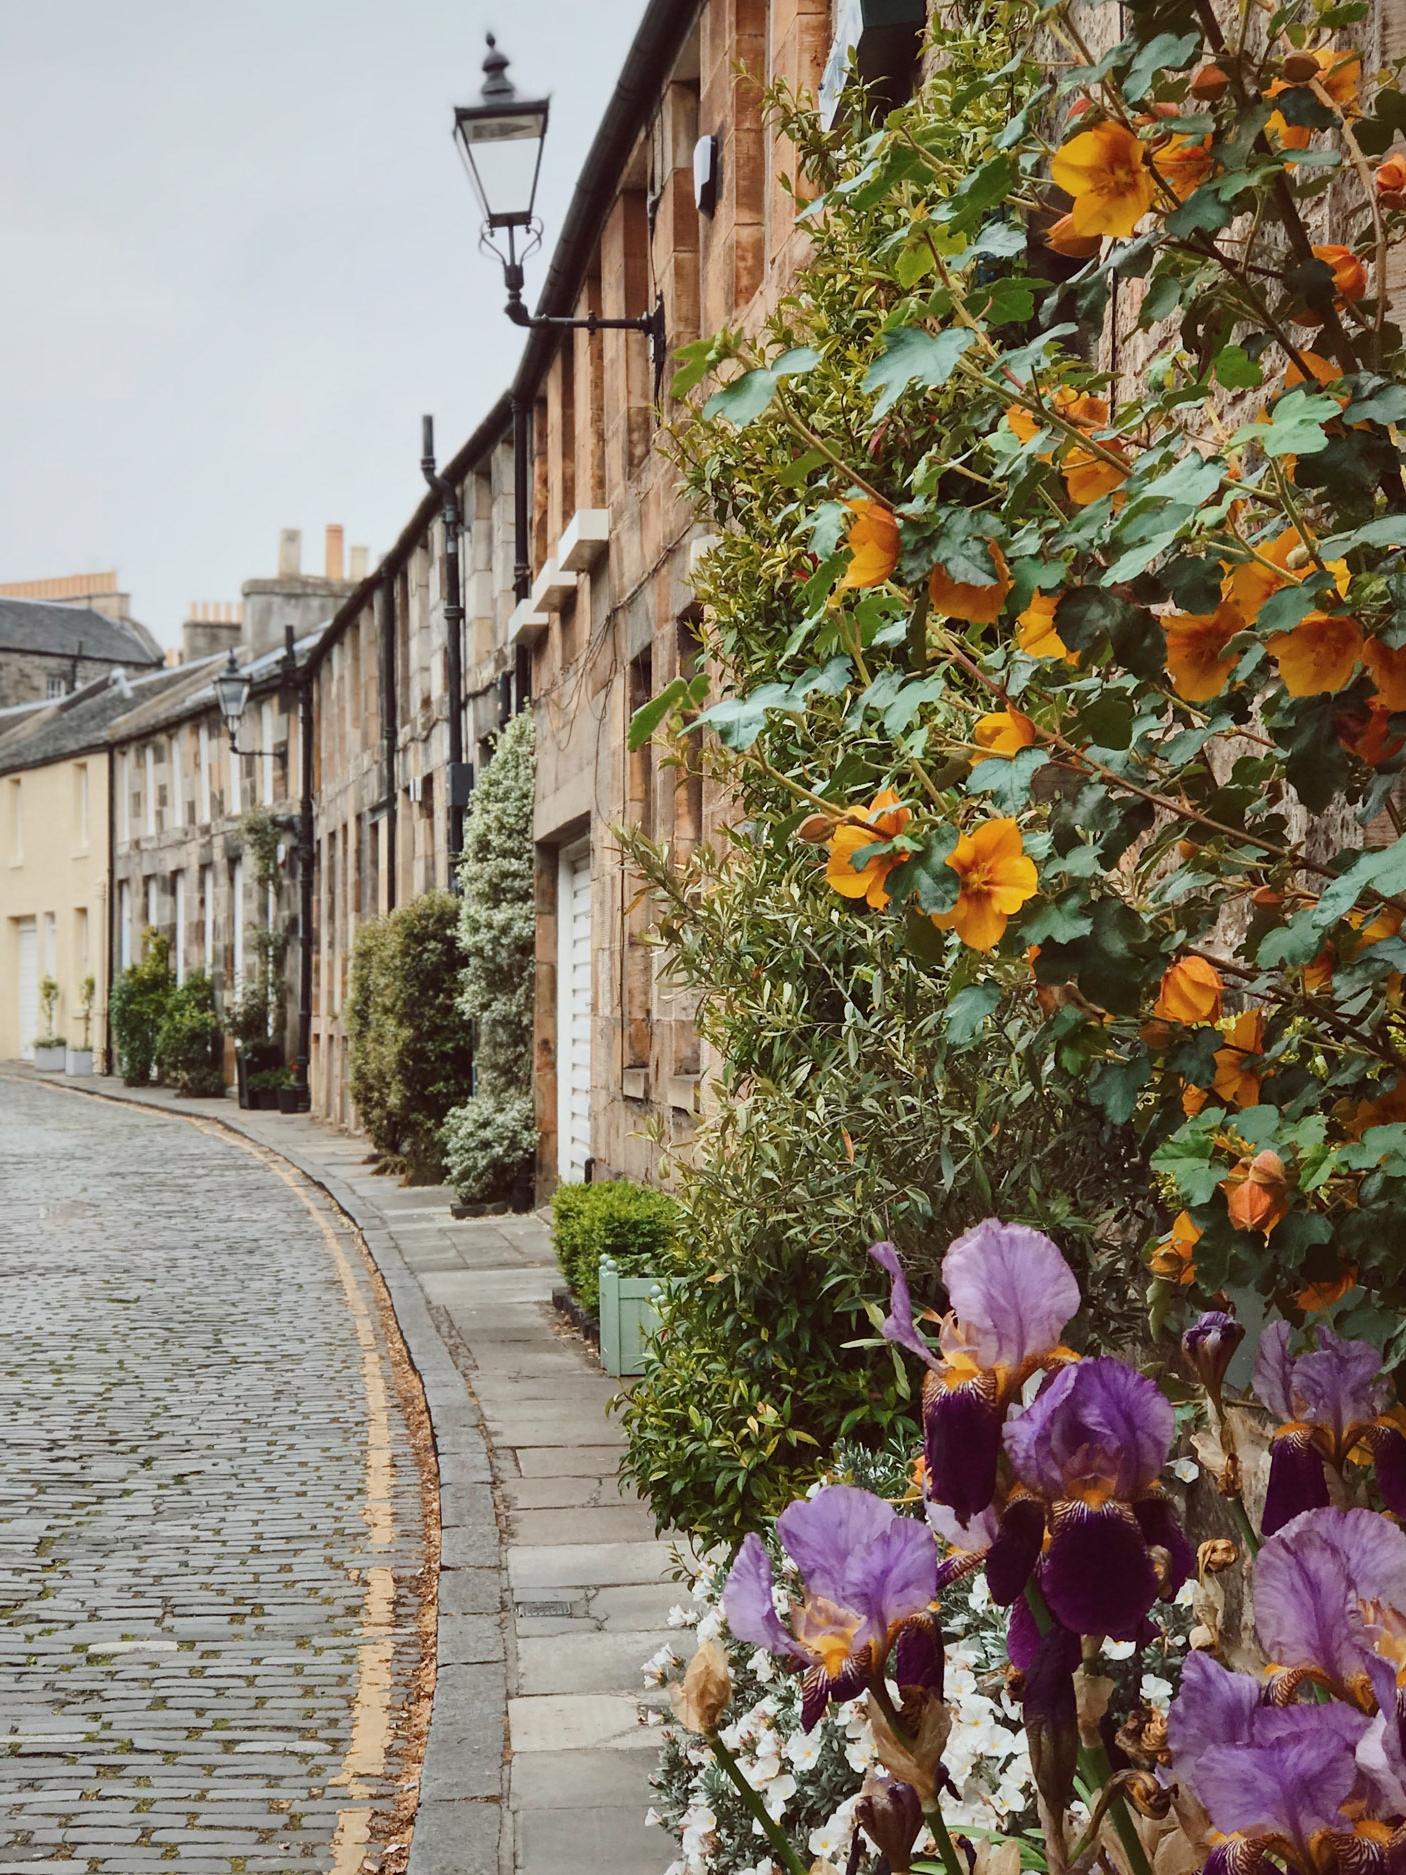 floral streets in Stockbridge, Edinburgh